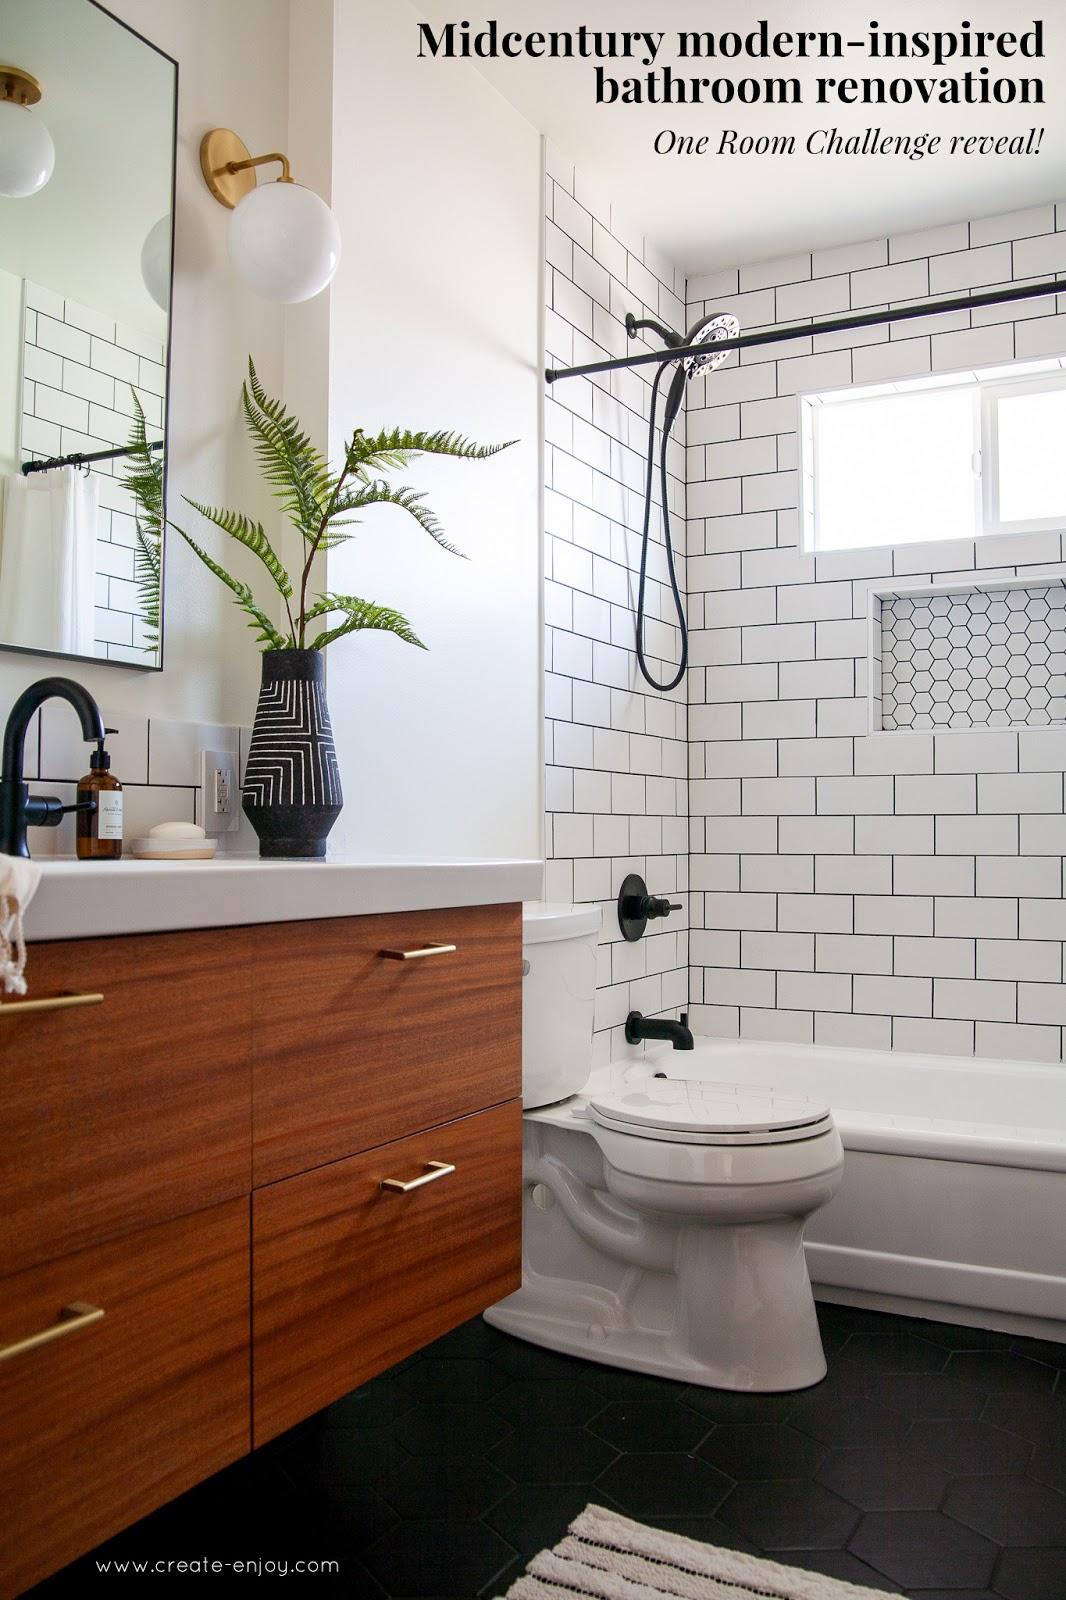 Modern Bathroom Renovation Reveal The Finished One Room Challenge Create Enjoy